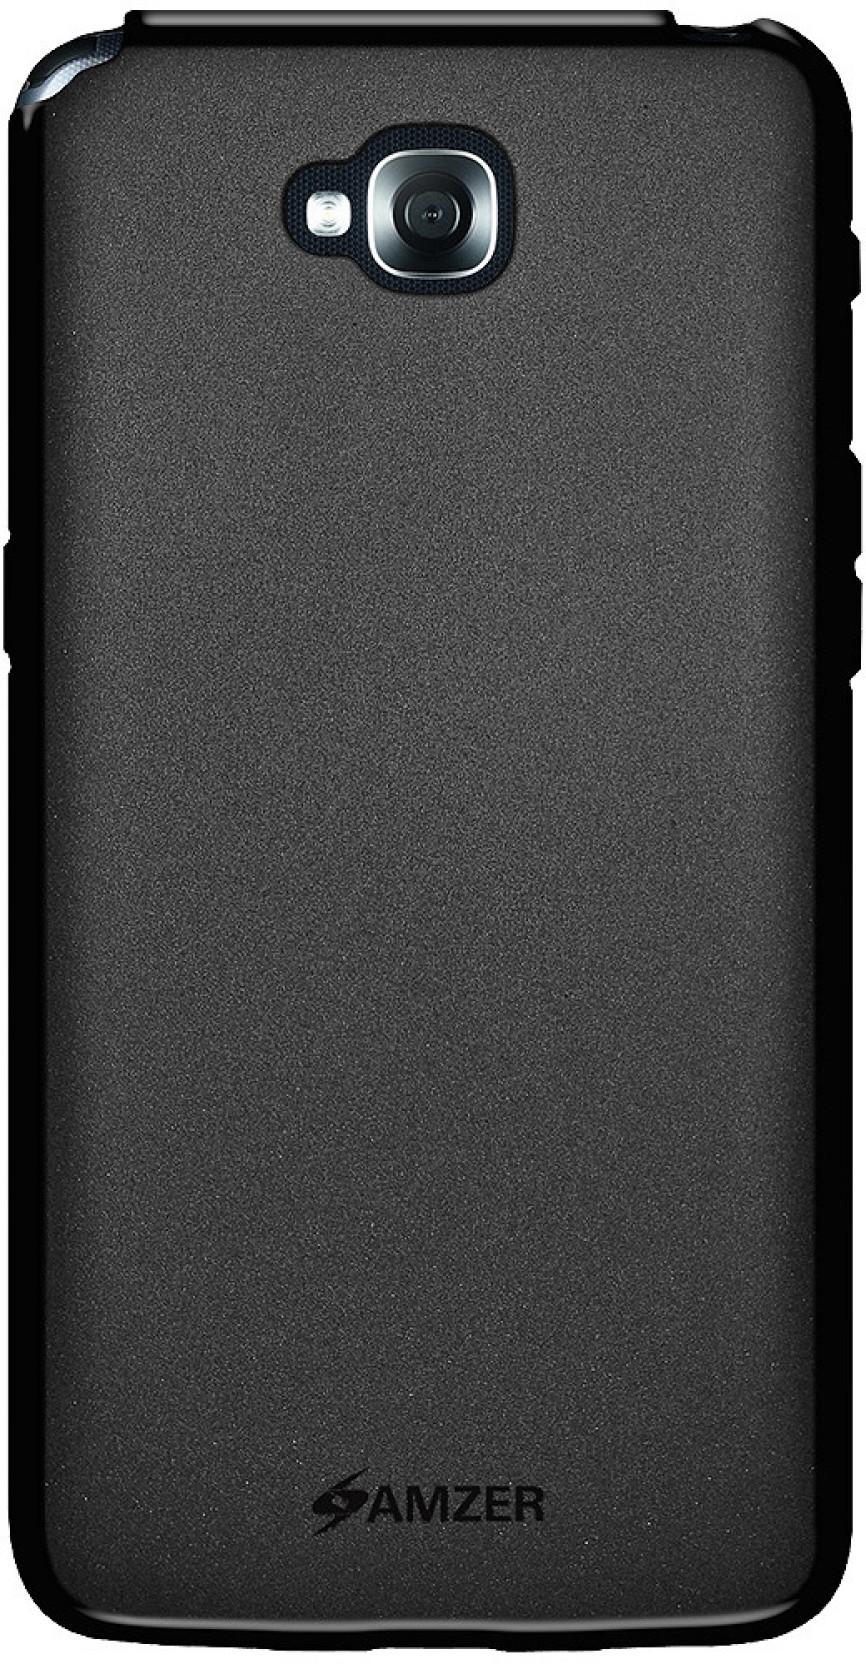 Amzer Back Cover For Lg G Pro Lite D686 Black Home